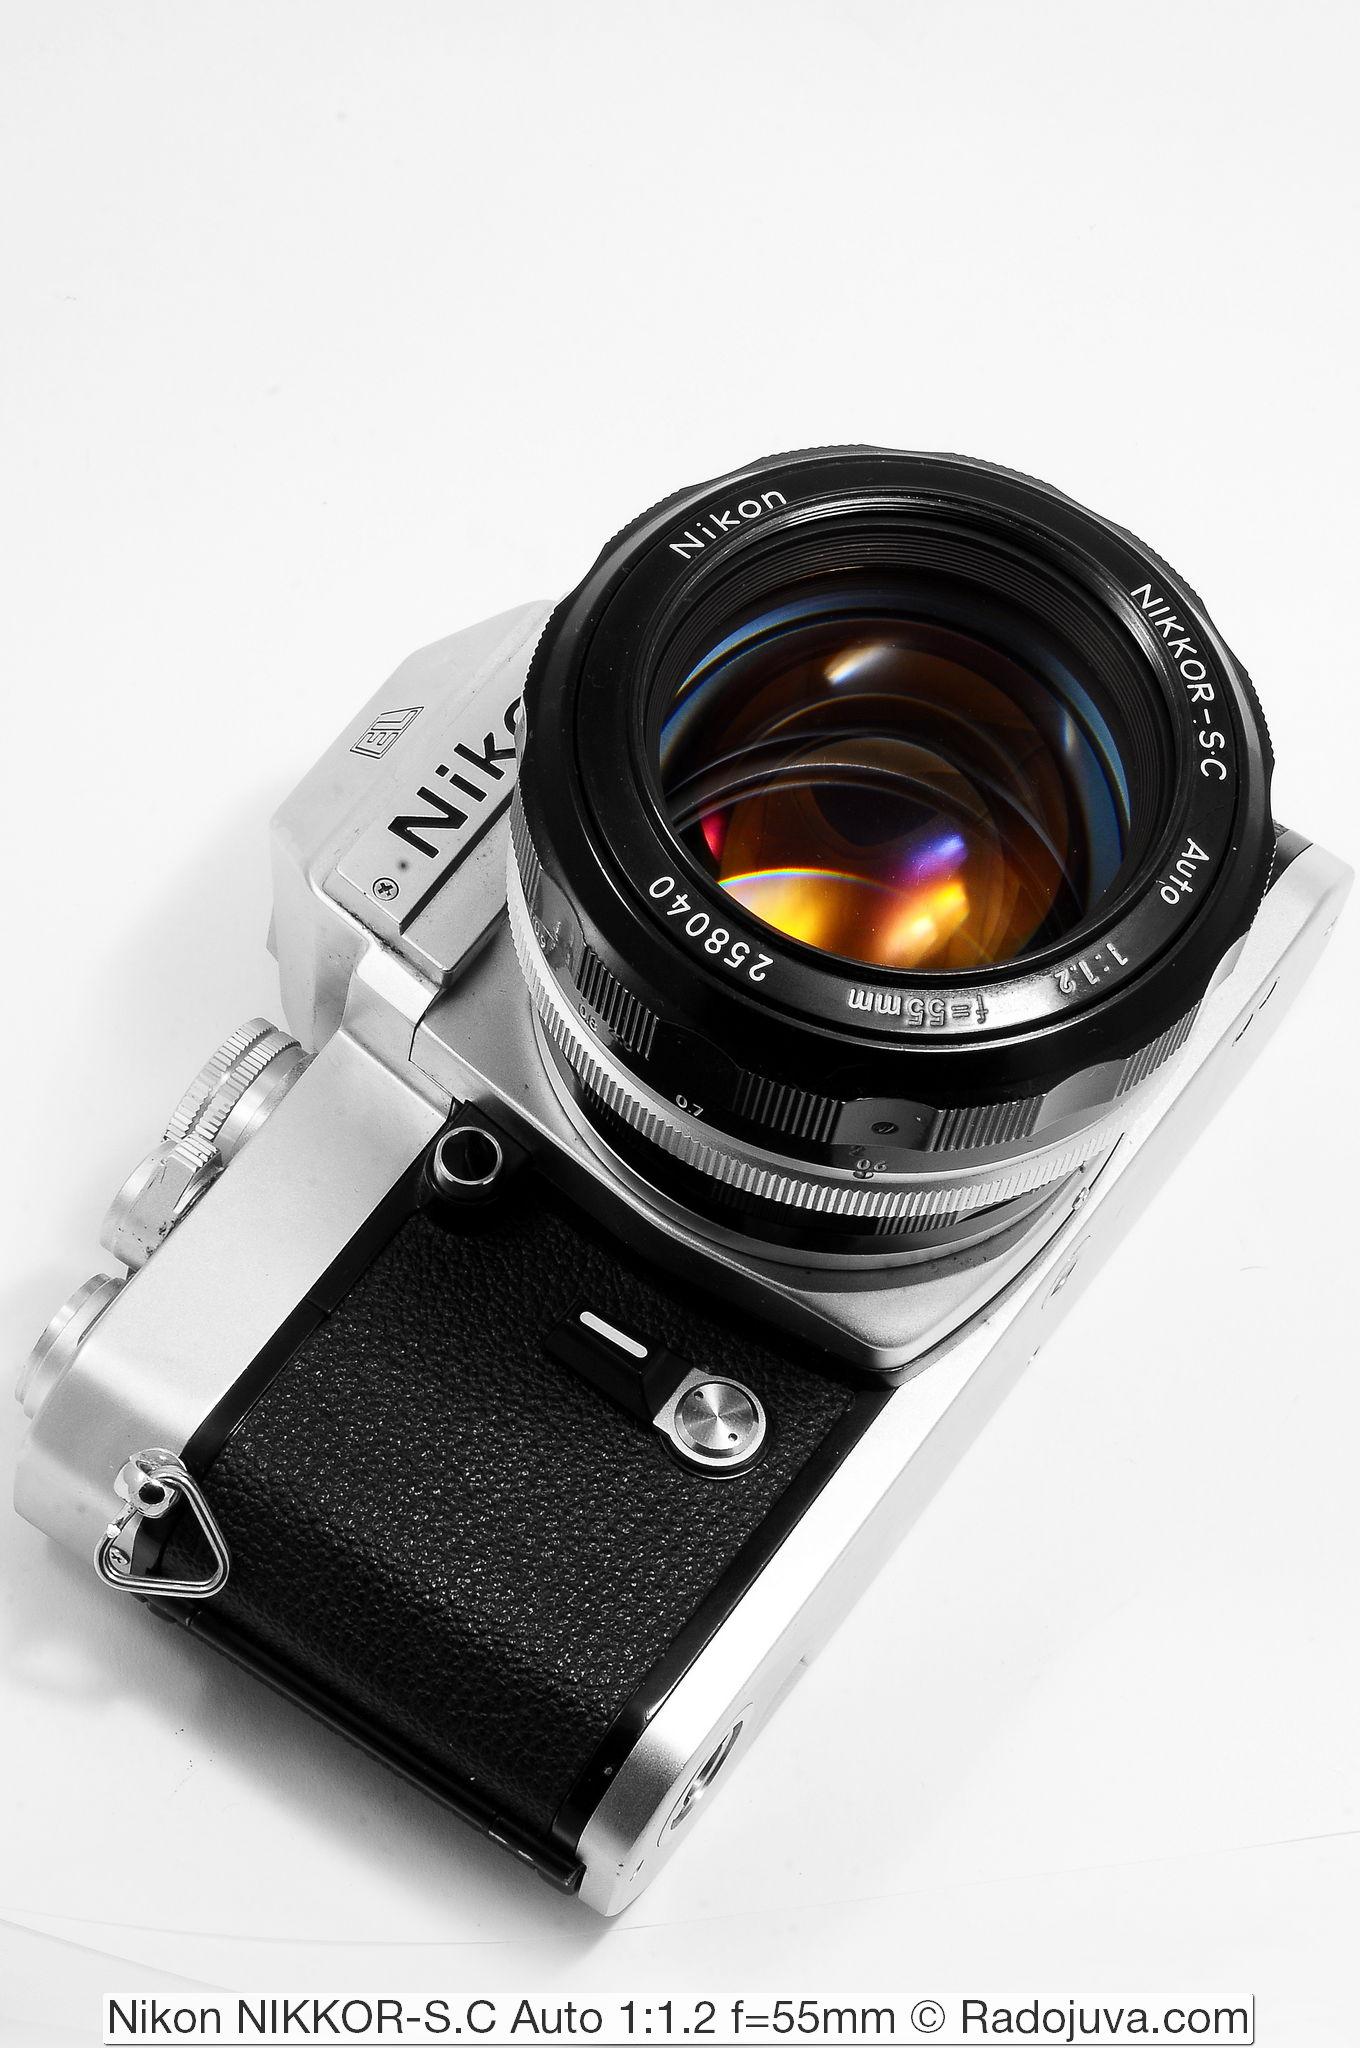 Nikon NIKKOR-S.C Auto 1:1.2 f=55mm